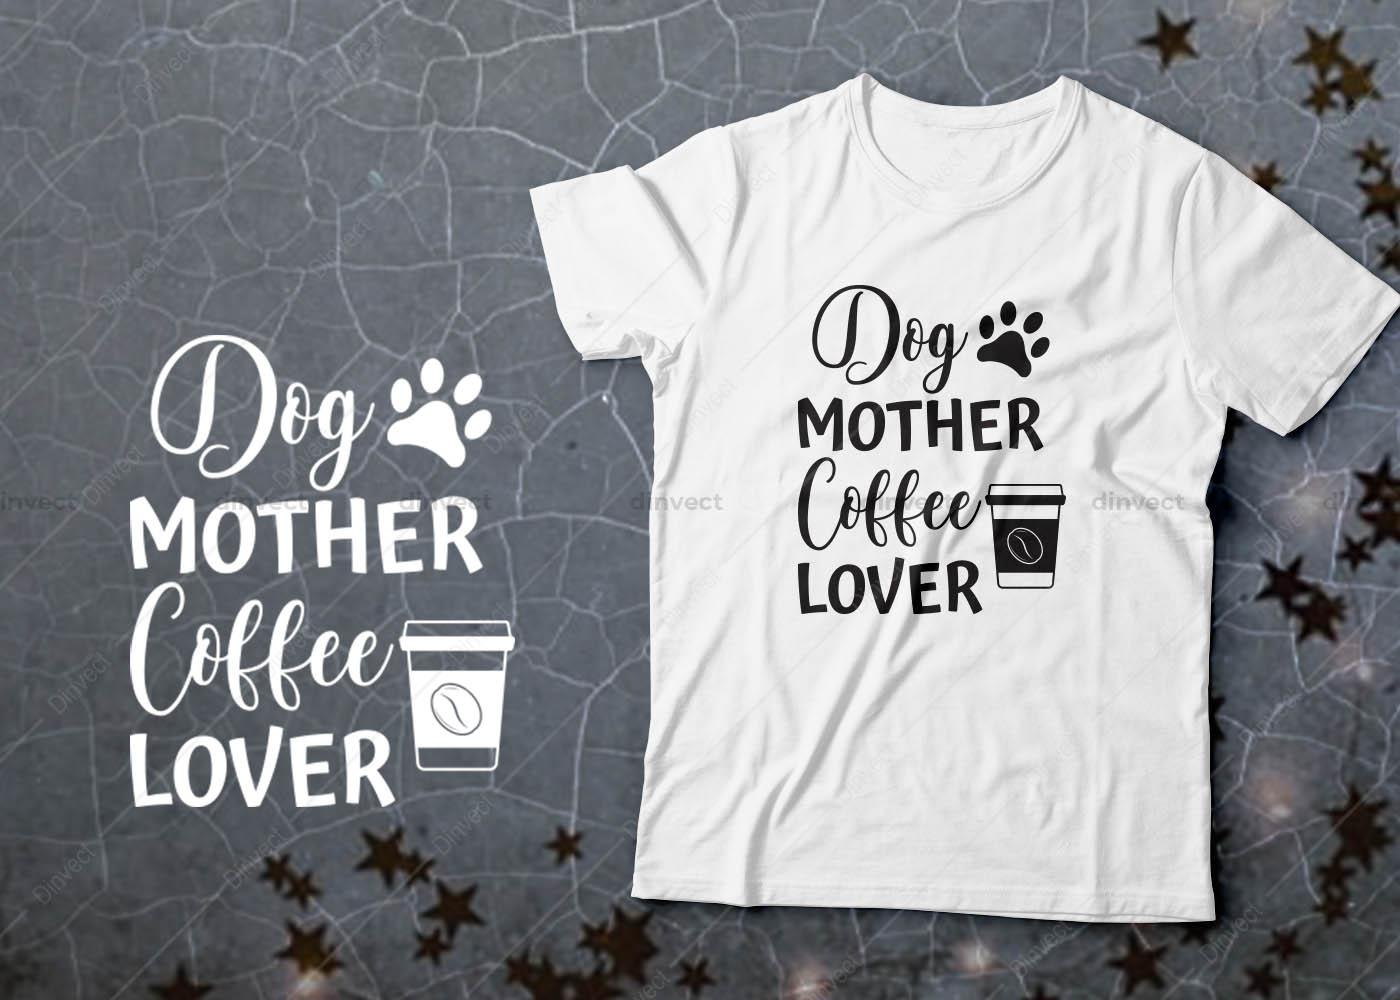 Coffee SVG, Coffee Bundle Svg, Coffee Mug Svg, Funny Coffee Quotes SVG, Mug Design Svg, Coffee Quote - Coffee 5 -